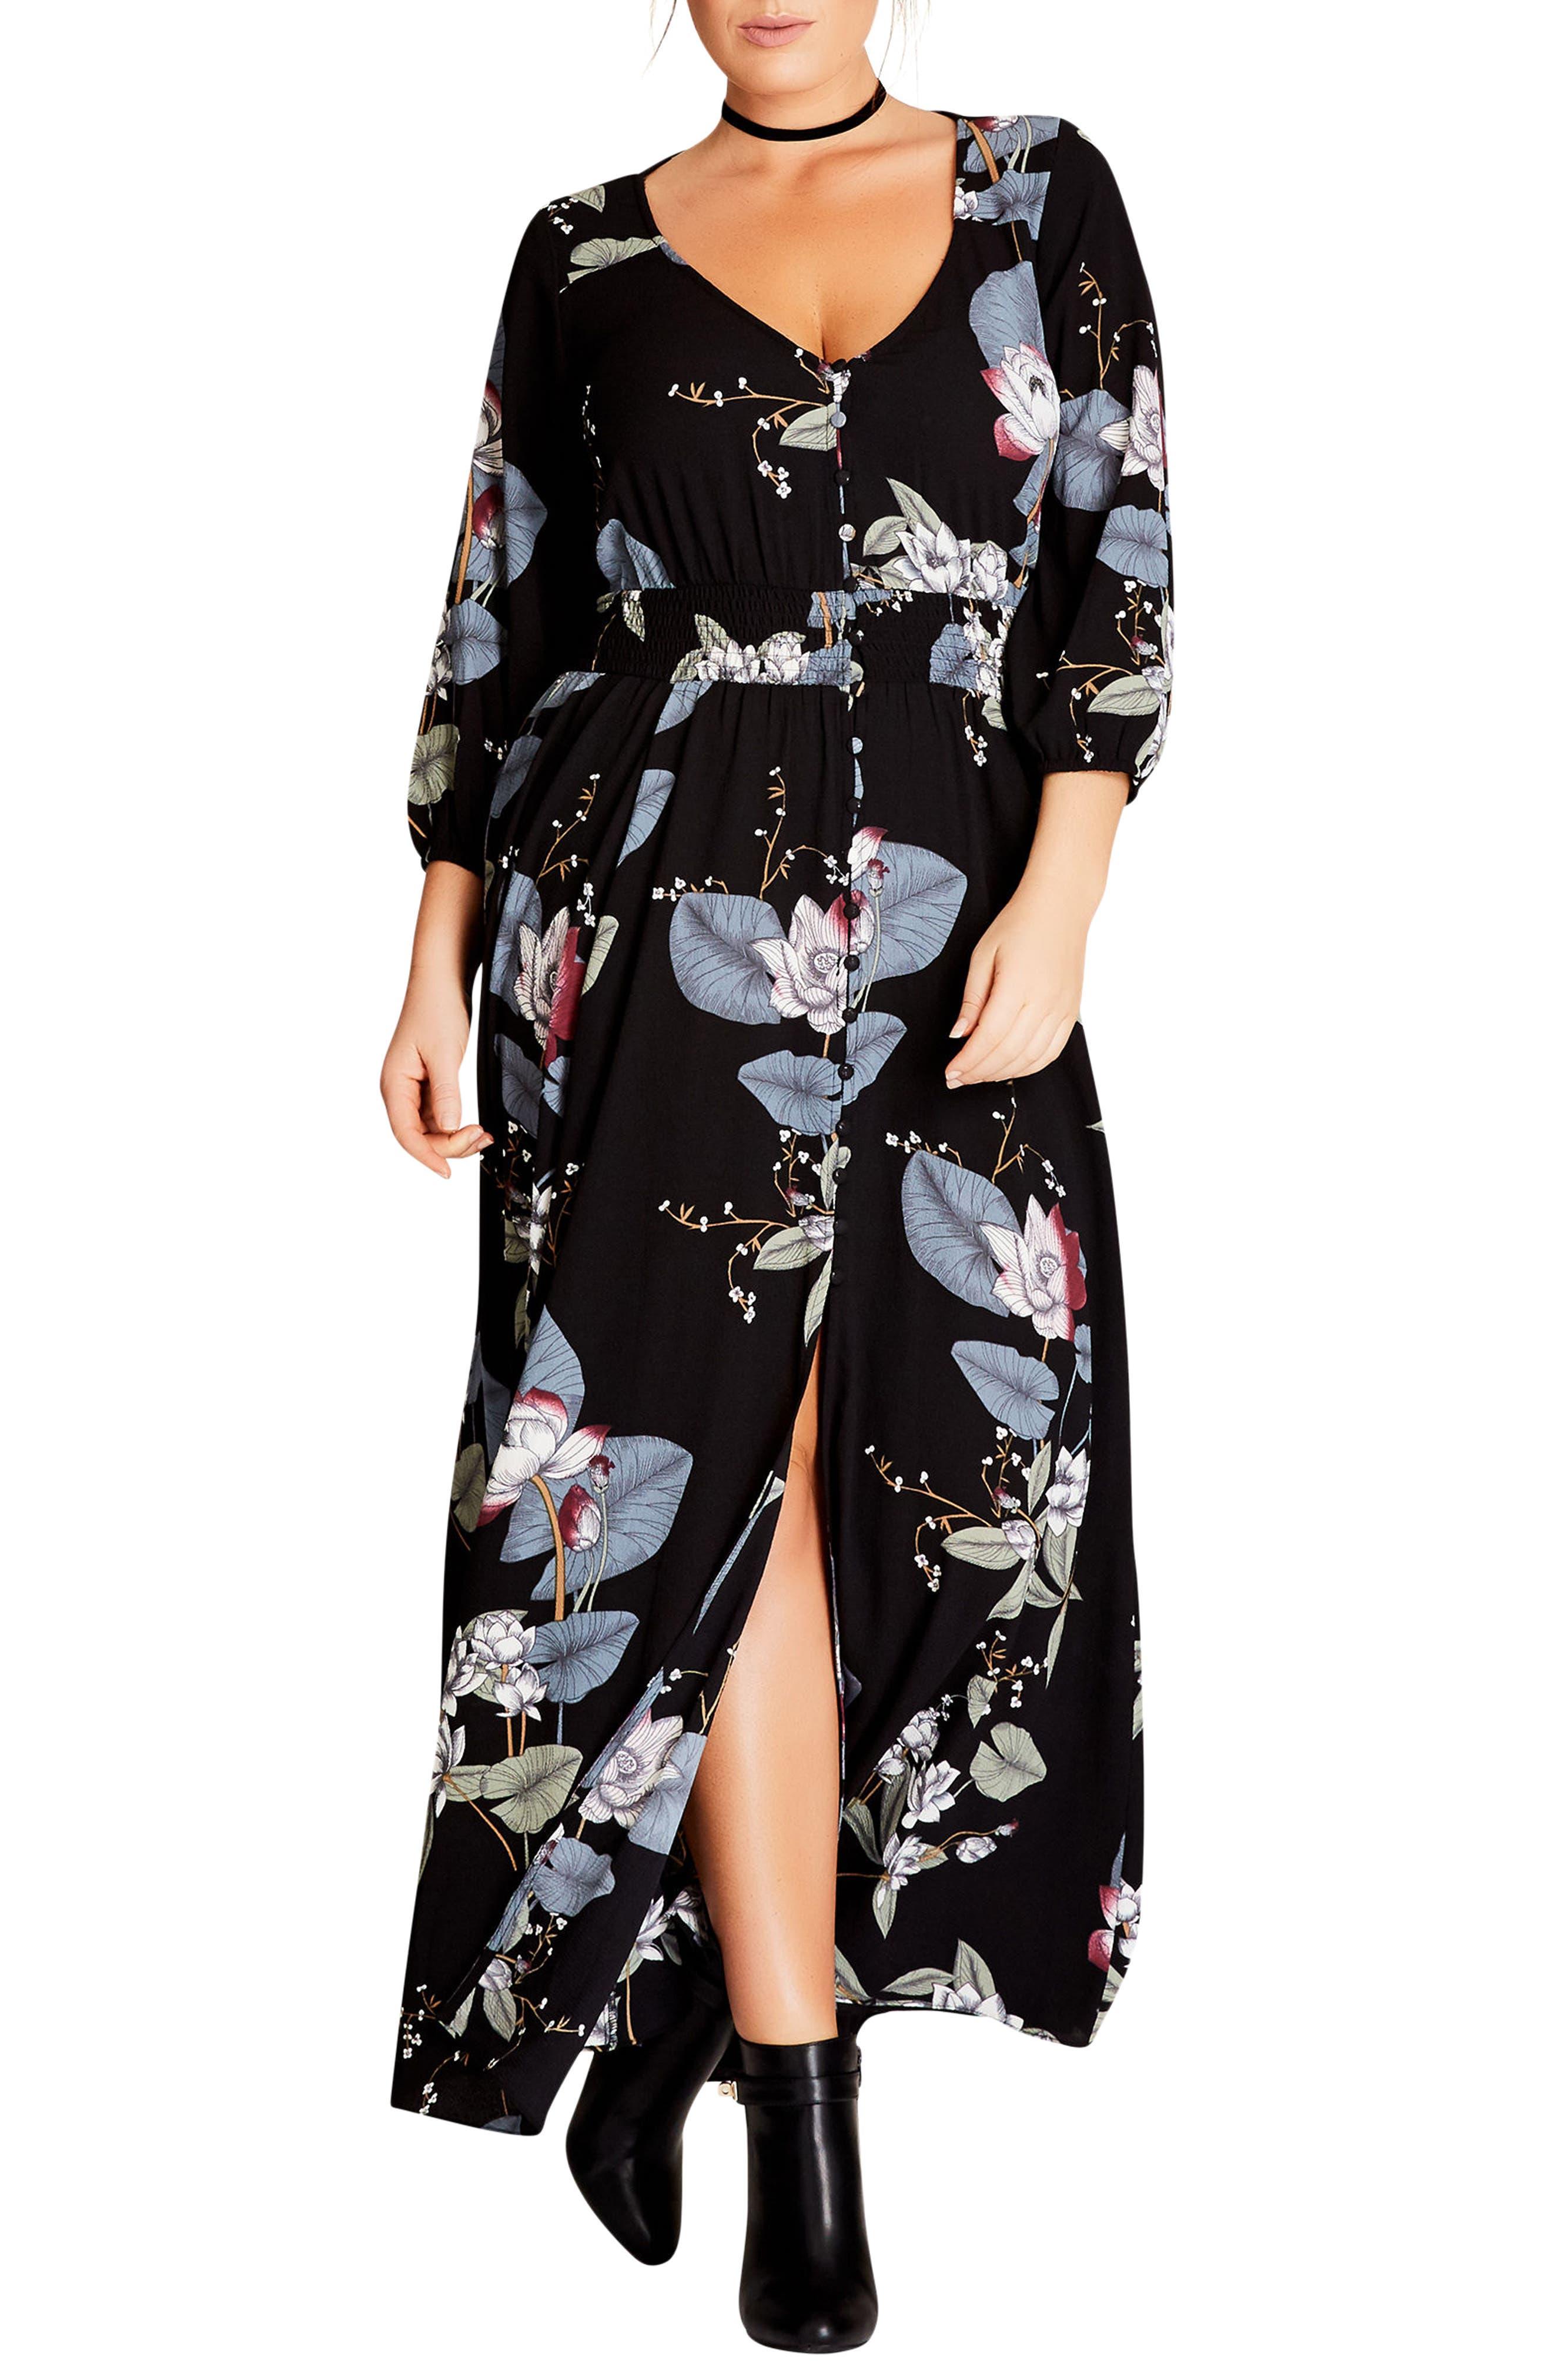 CITY CHIC, Blossom Maxi Dress, Main thumbnail 1, color, BLOSSOM